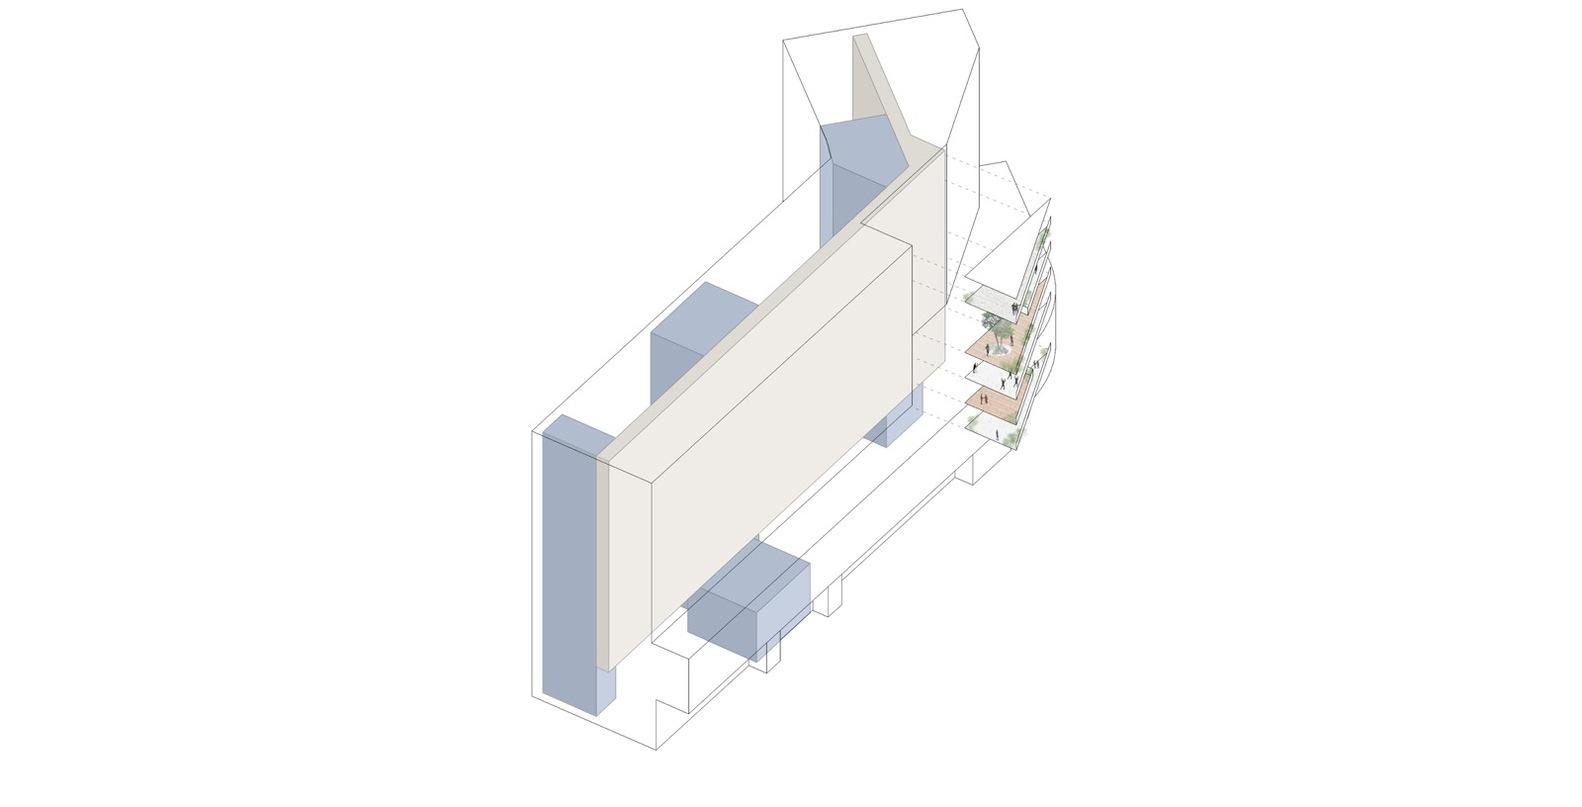 housing l diagrama espacio p blico [ 1582 x 807 Pixel ]